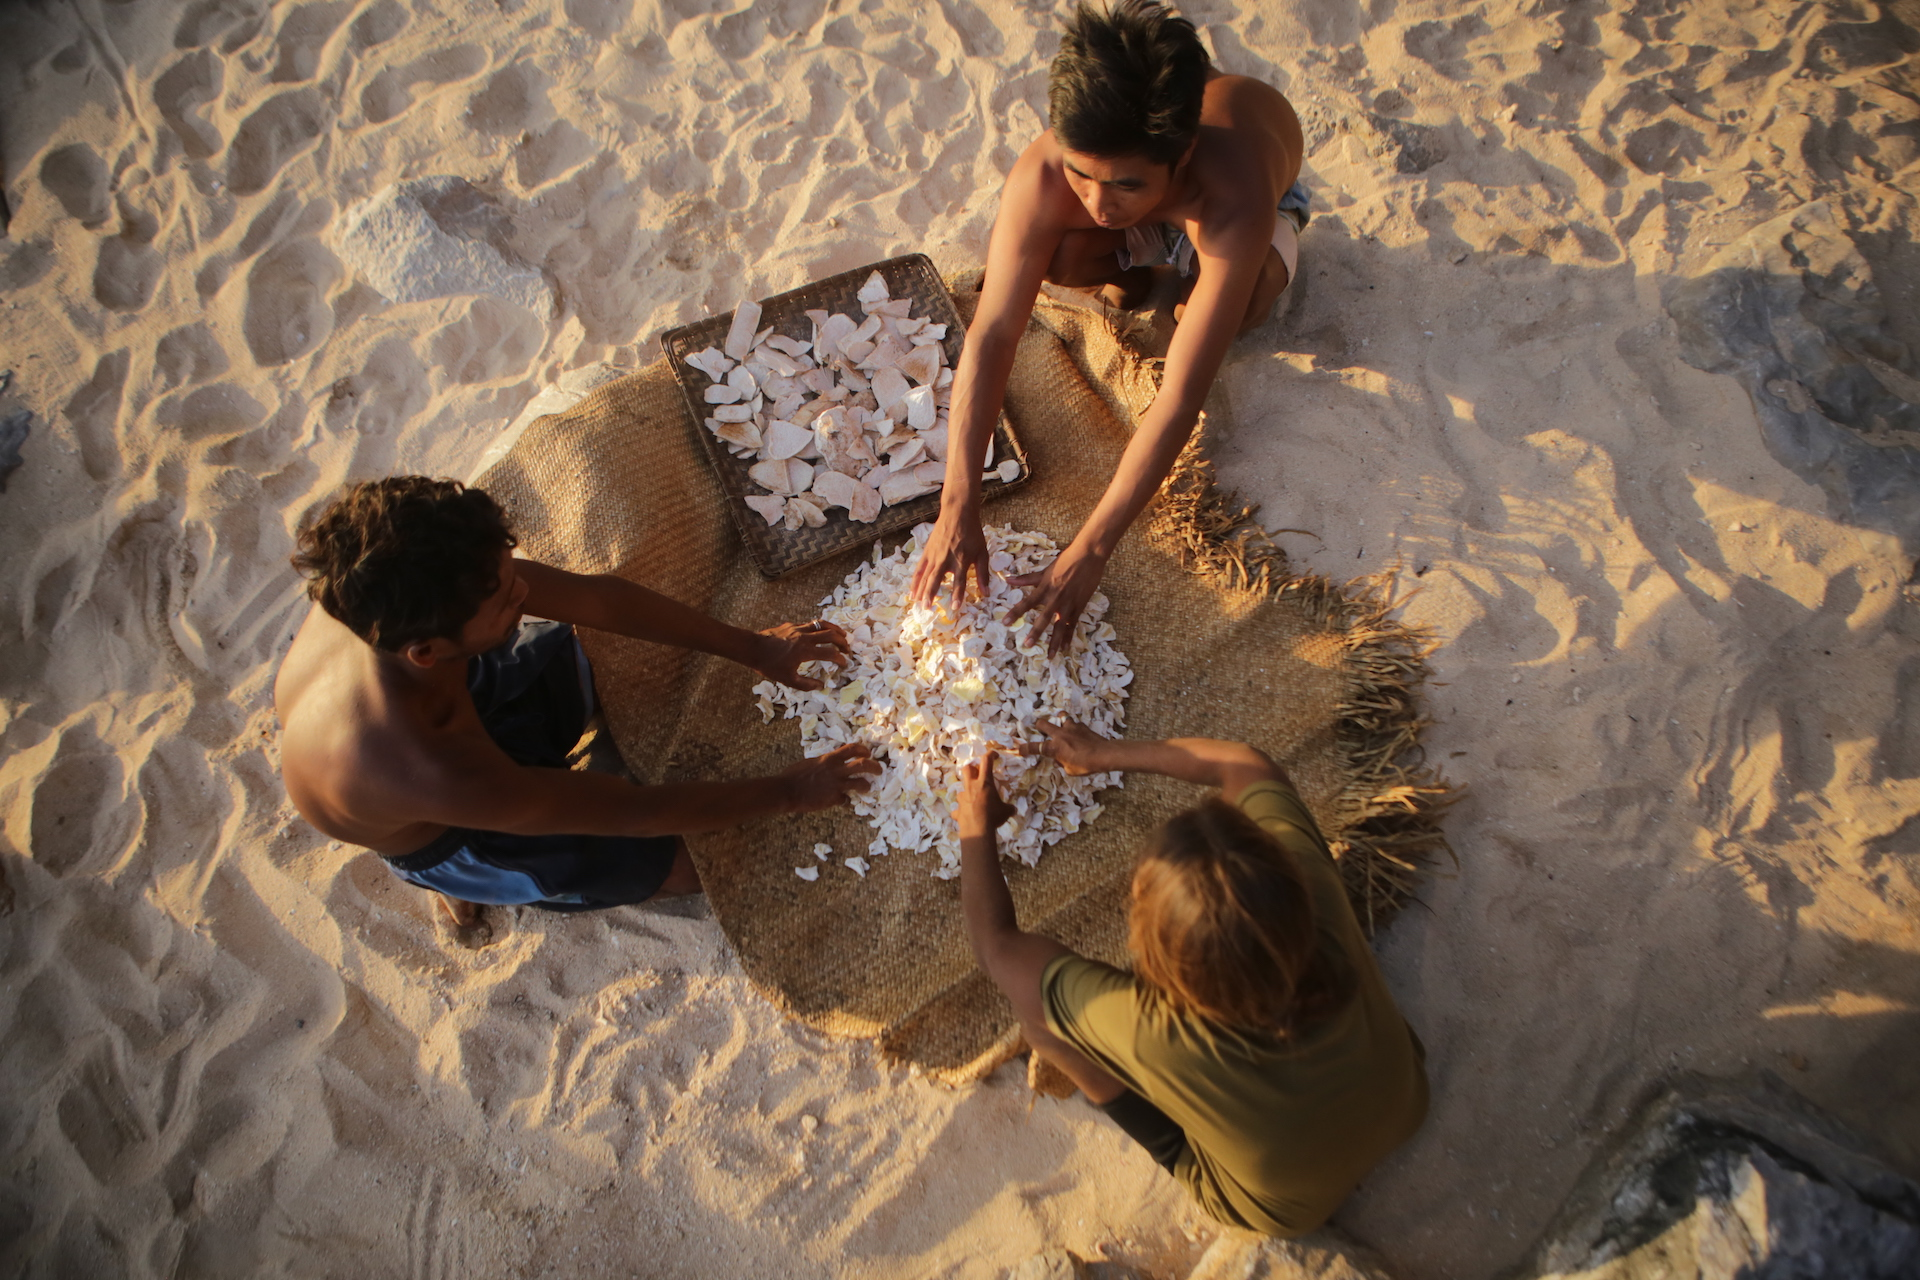 Tagbanua sorting out shells on the beach